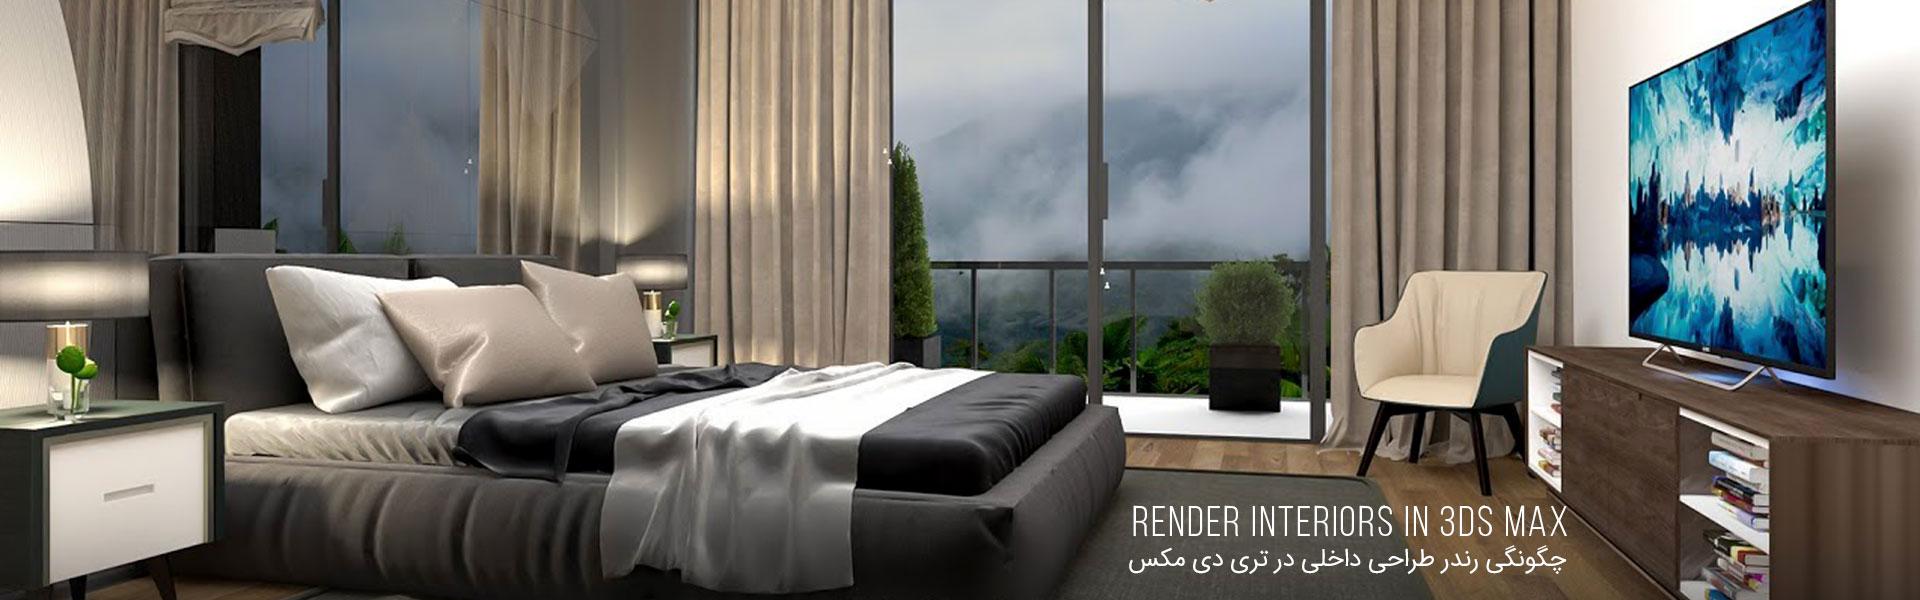 decorasion 3dmax render1 - چگونگی رندر طراحی داخلی در تری دی مکس